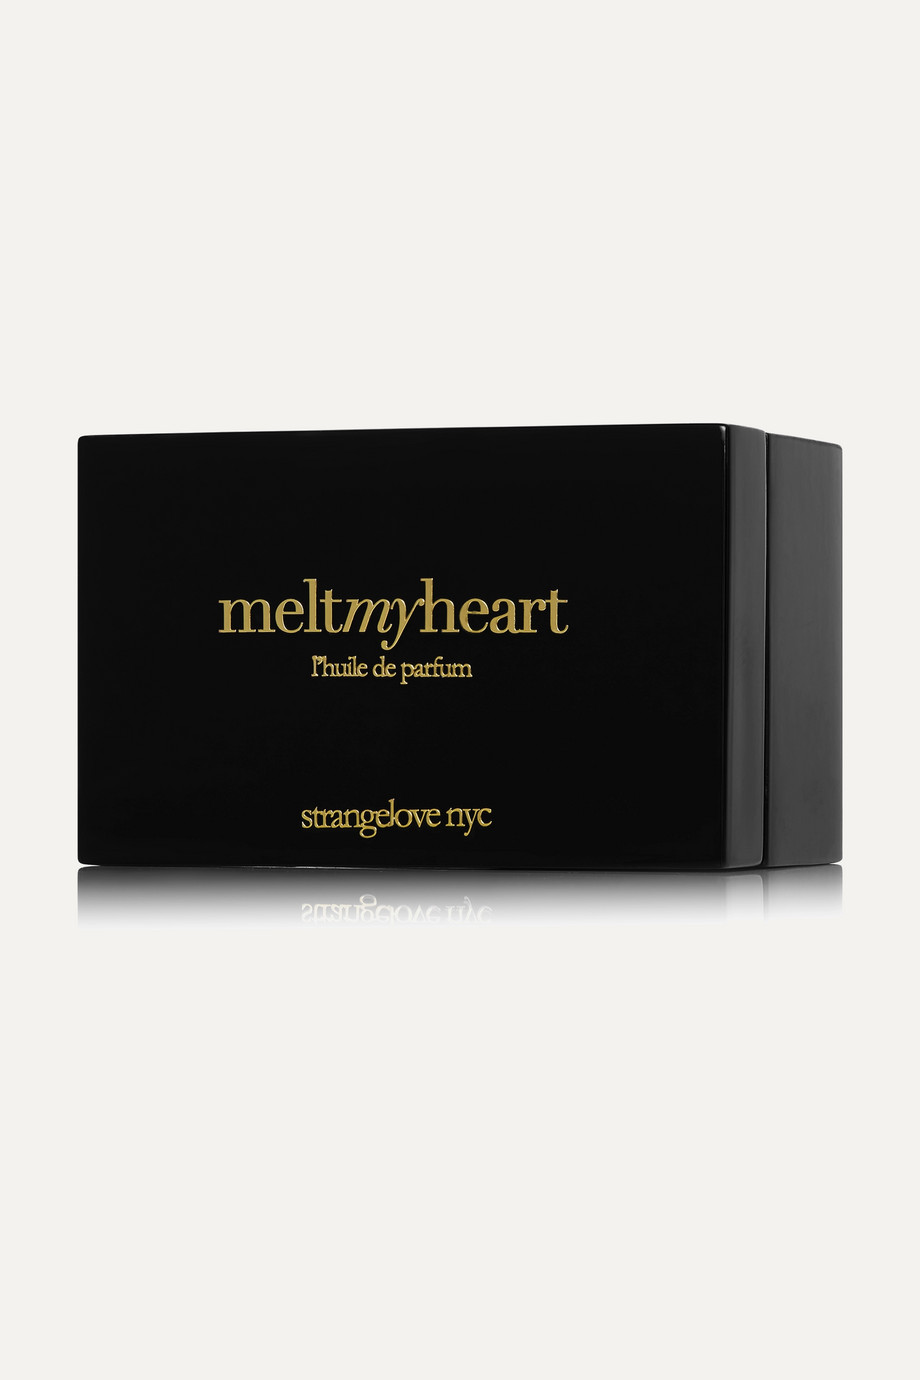 strangelove nyc Perfume Oil Travel Set - meltmyheart, 3 x 1.25ml